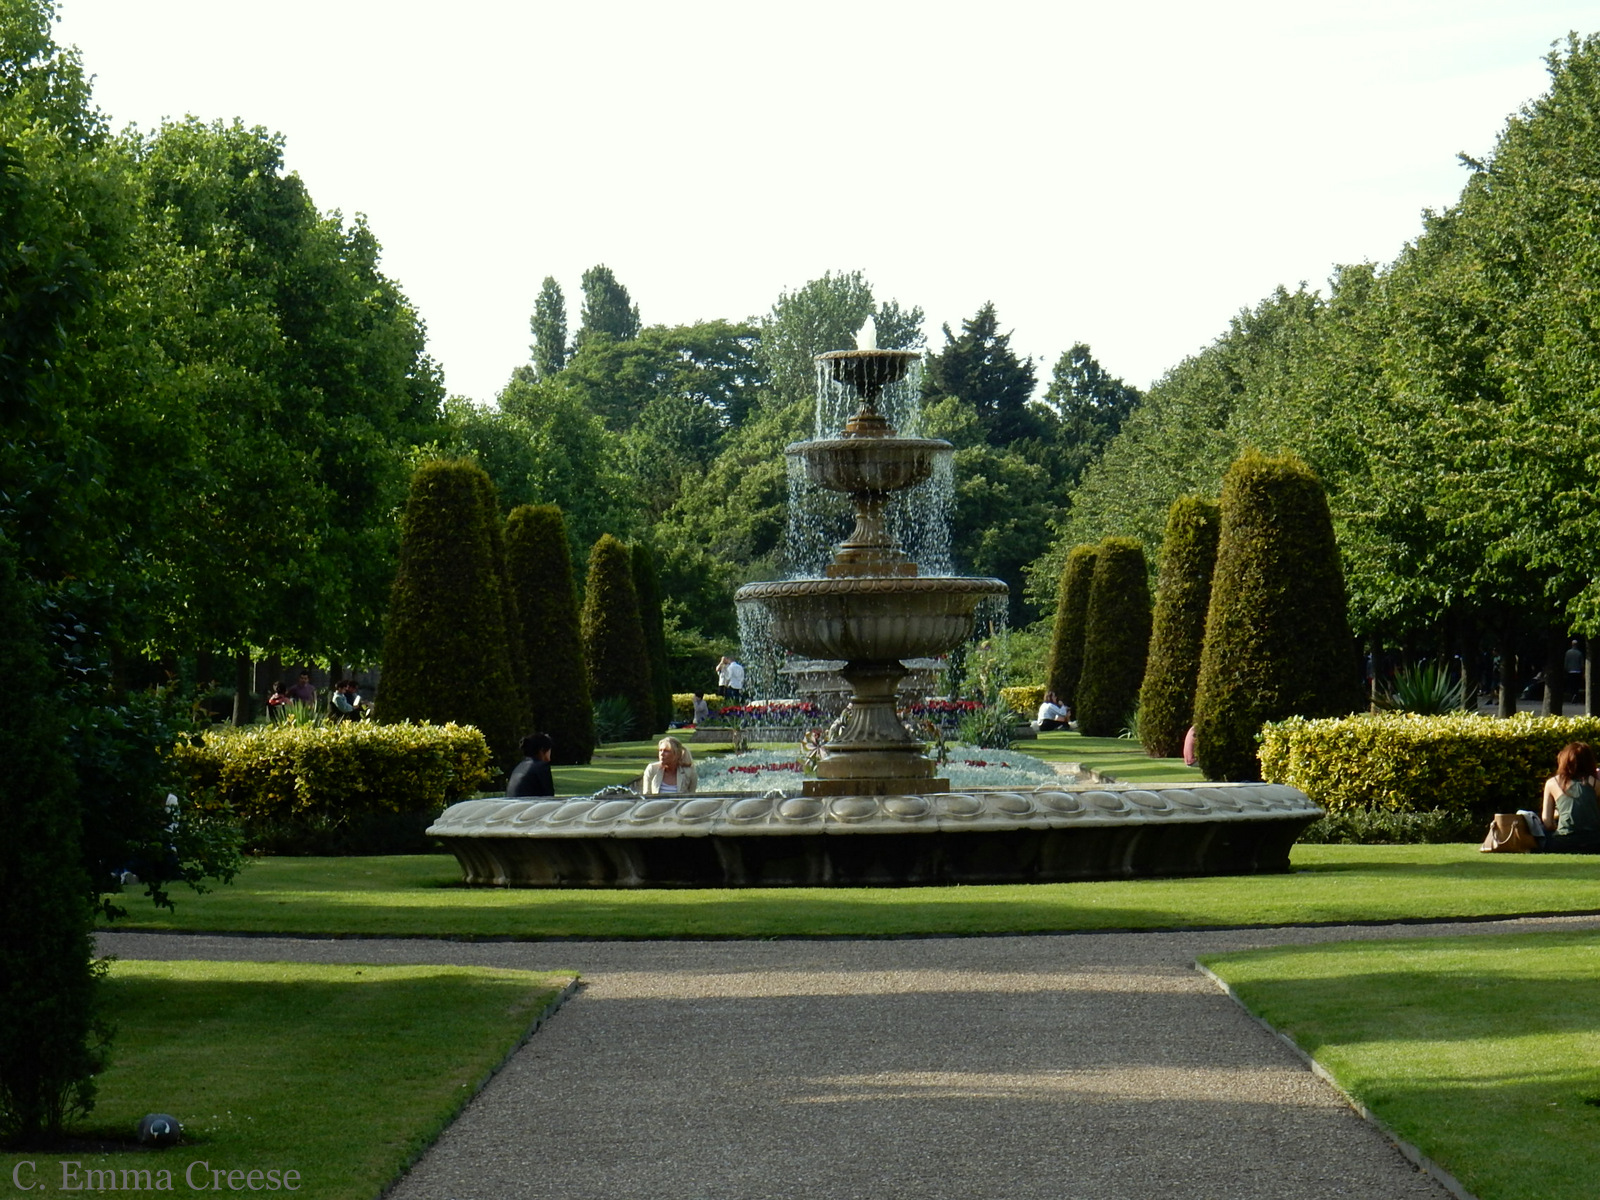 Regents Park The 10 best picnic spots in London Adventures of a London Kiwi